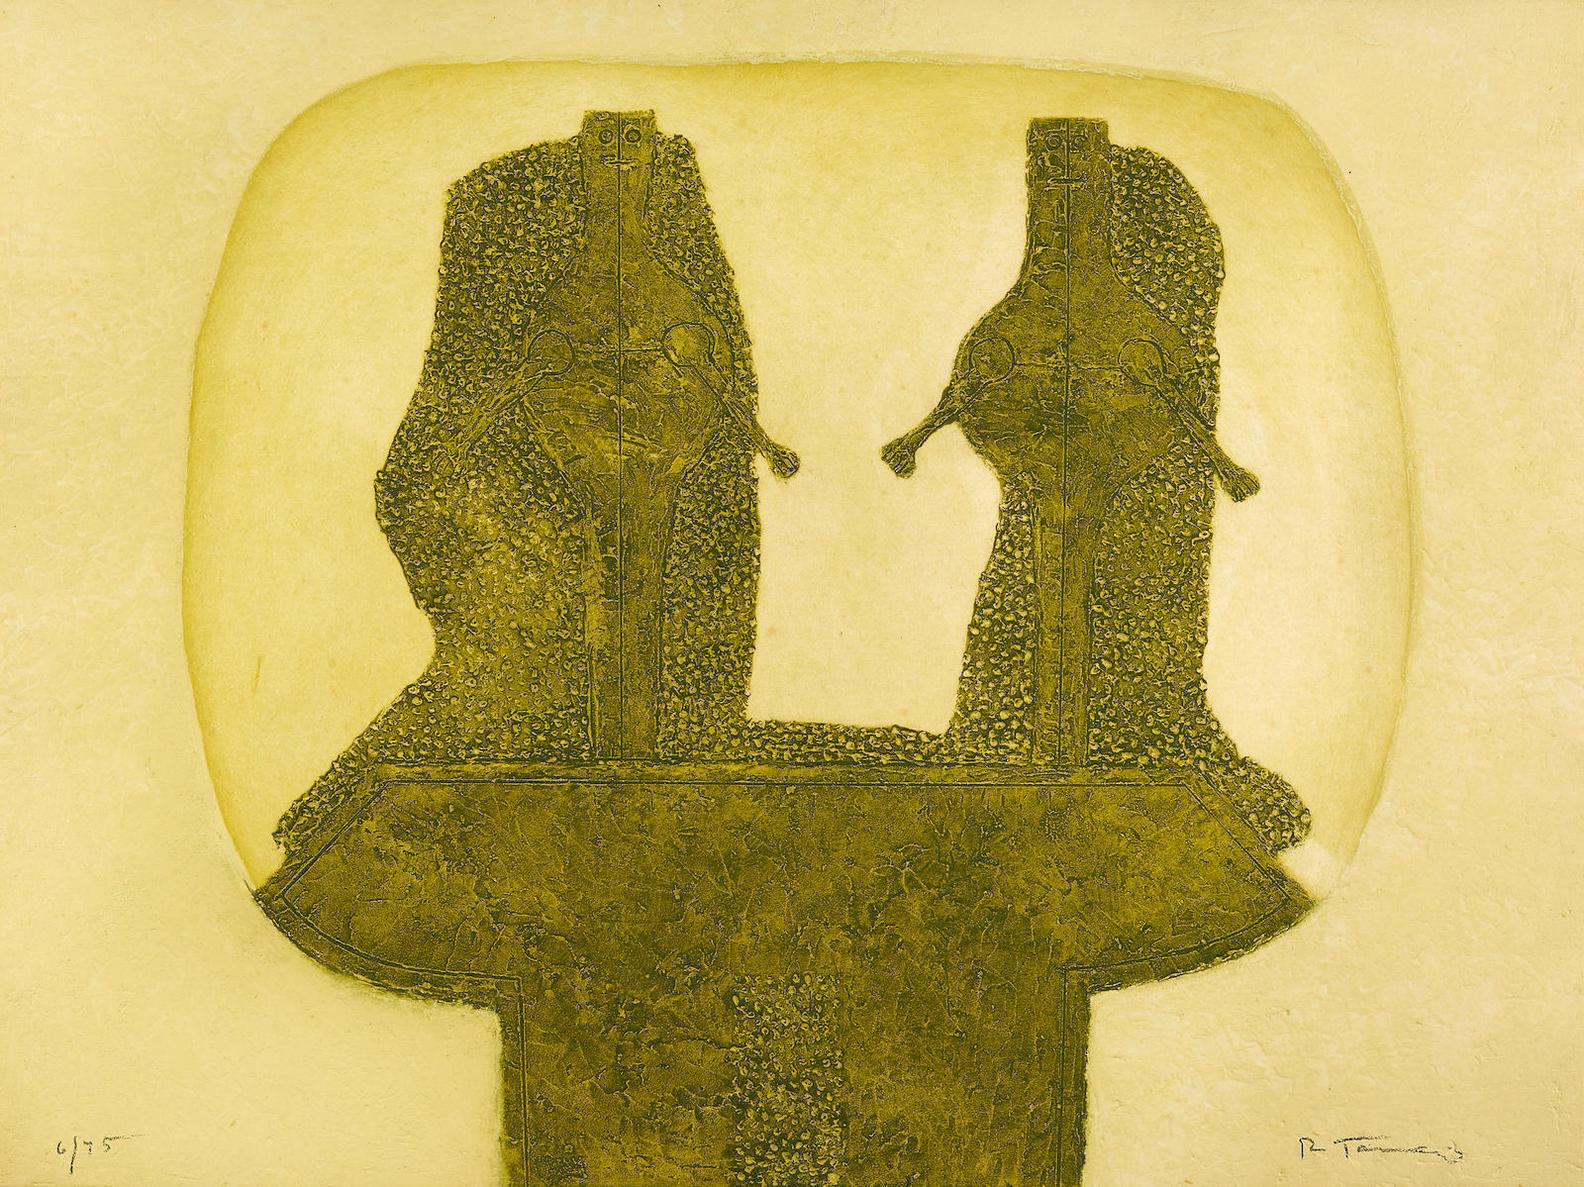 Rufino Tamayo-Dos Figuras, From Rufino Tamayo 16 Aguafuertes (P. 205)-1976